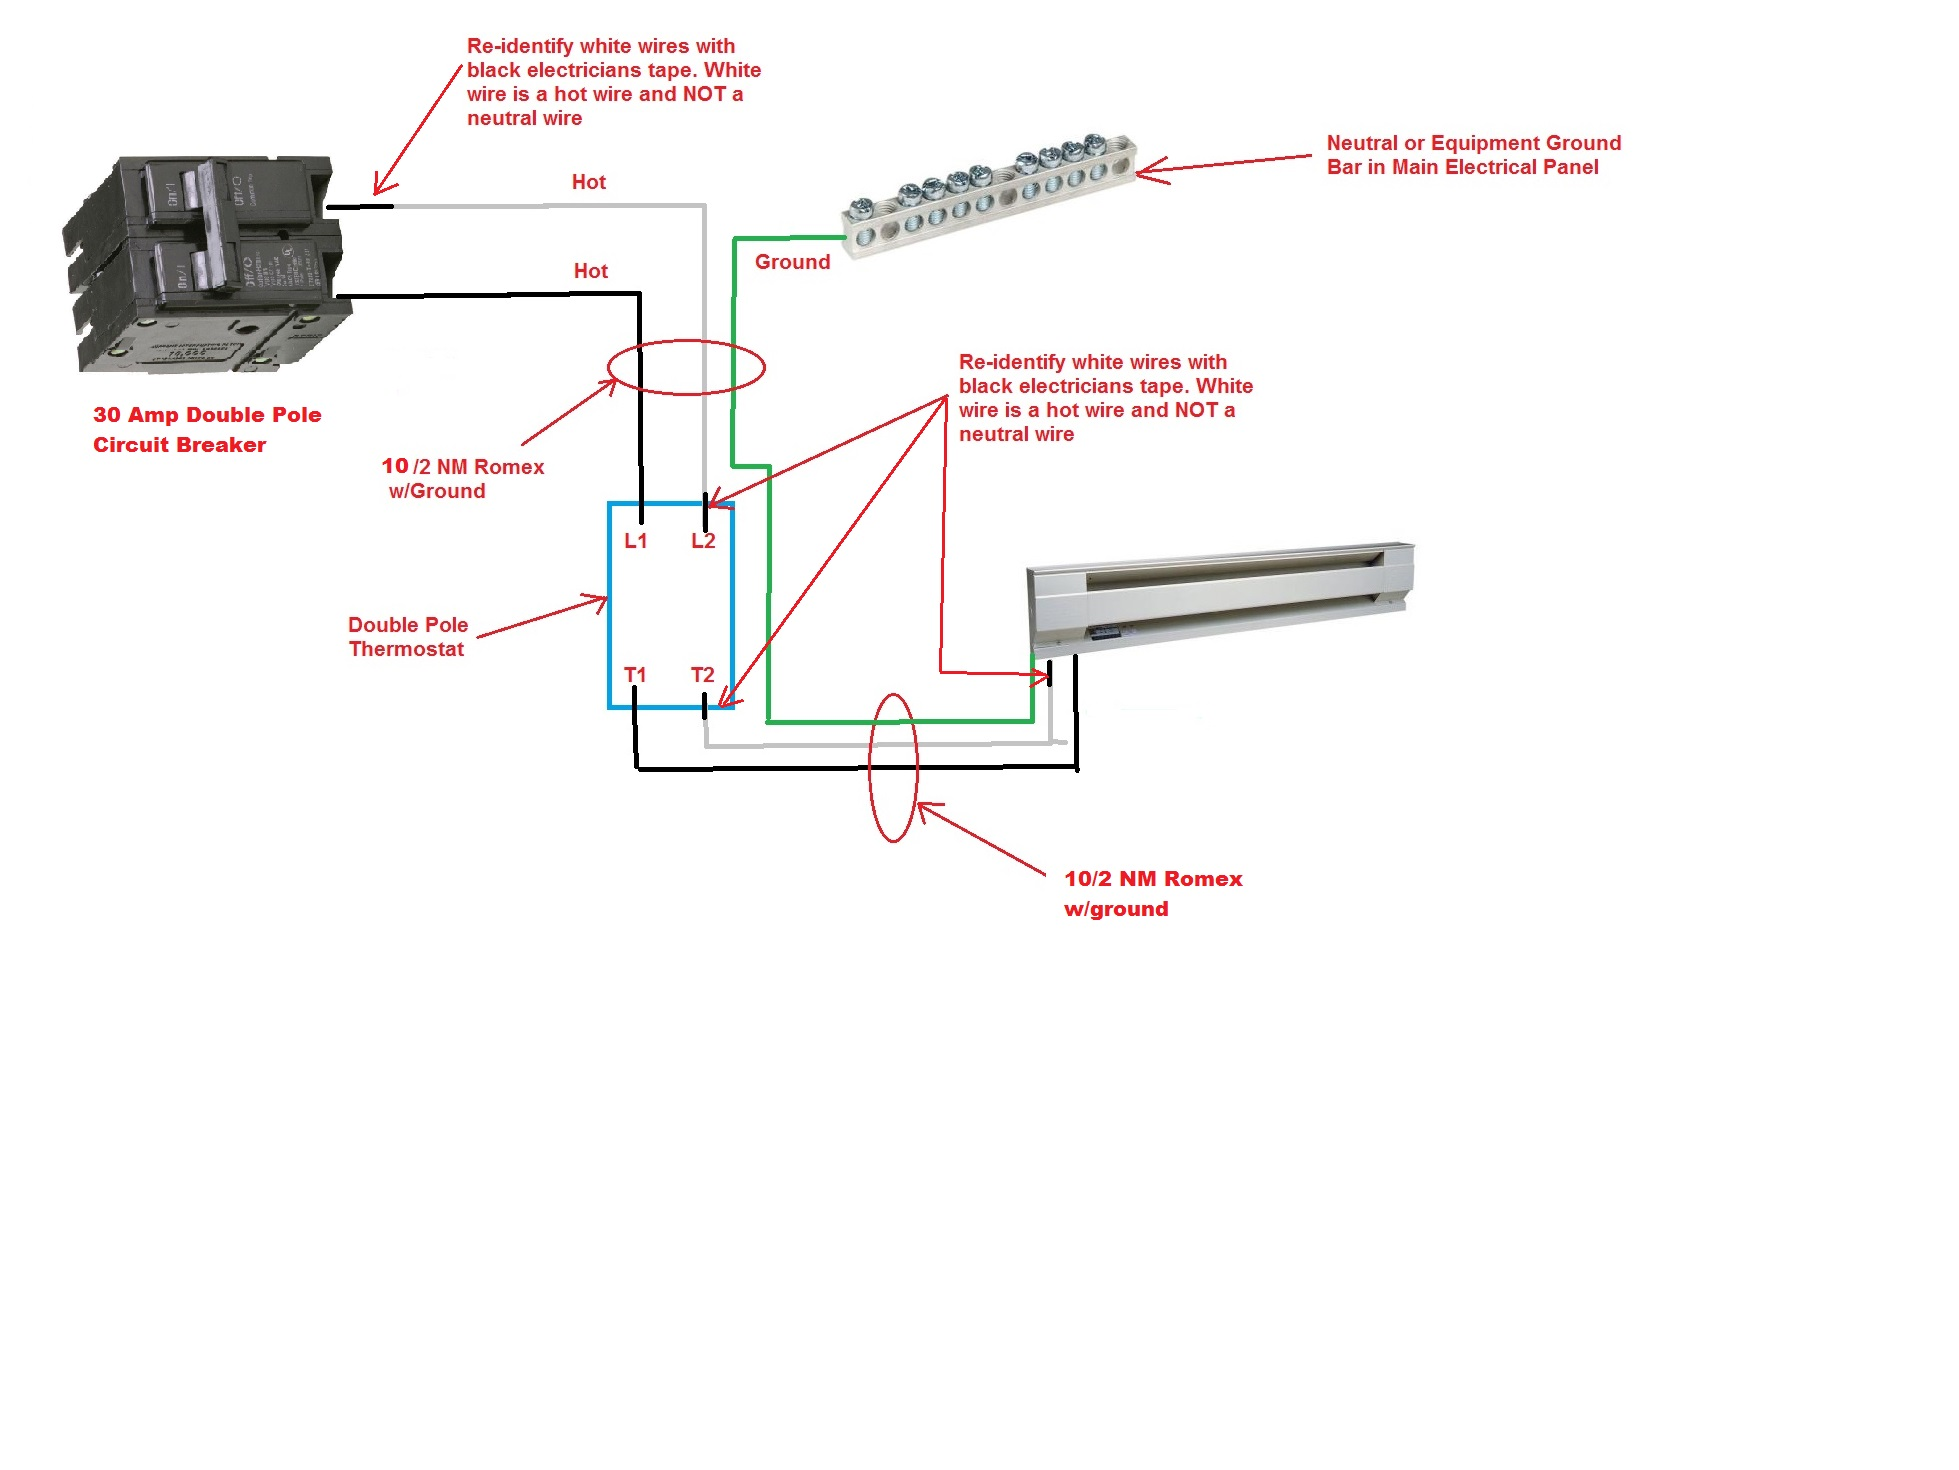 9e66c6ef-bae7-49c5-94e5-3de573b23ced_Baseboard Diagram 30 amp.jpg